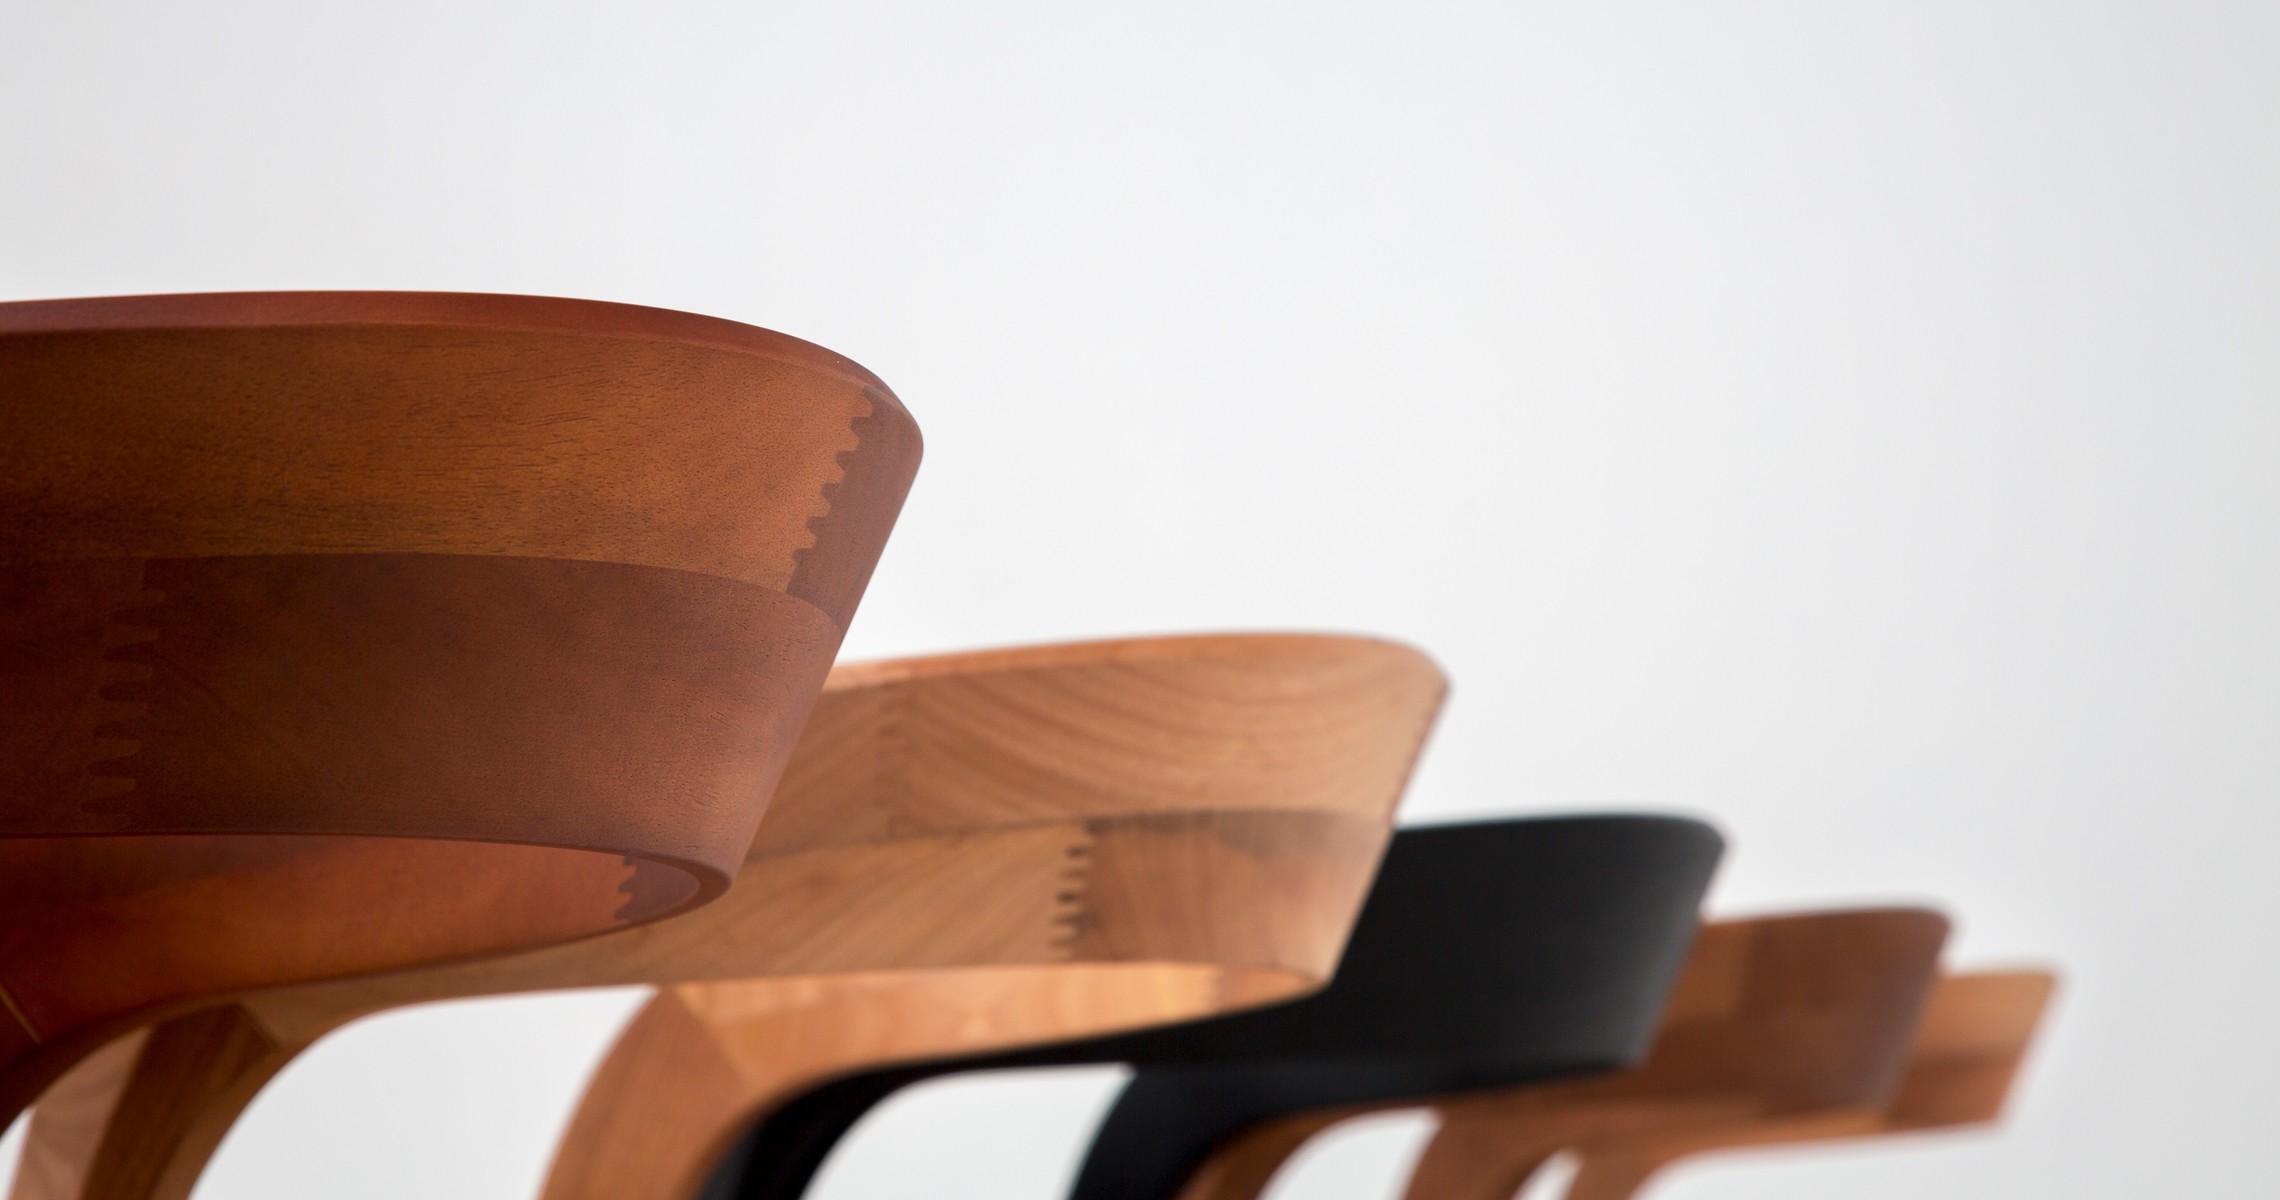 [Cadeira Pris] Fullbanner 3